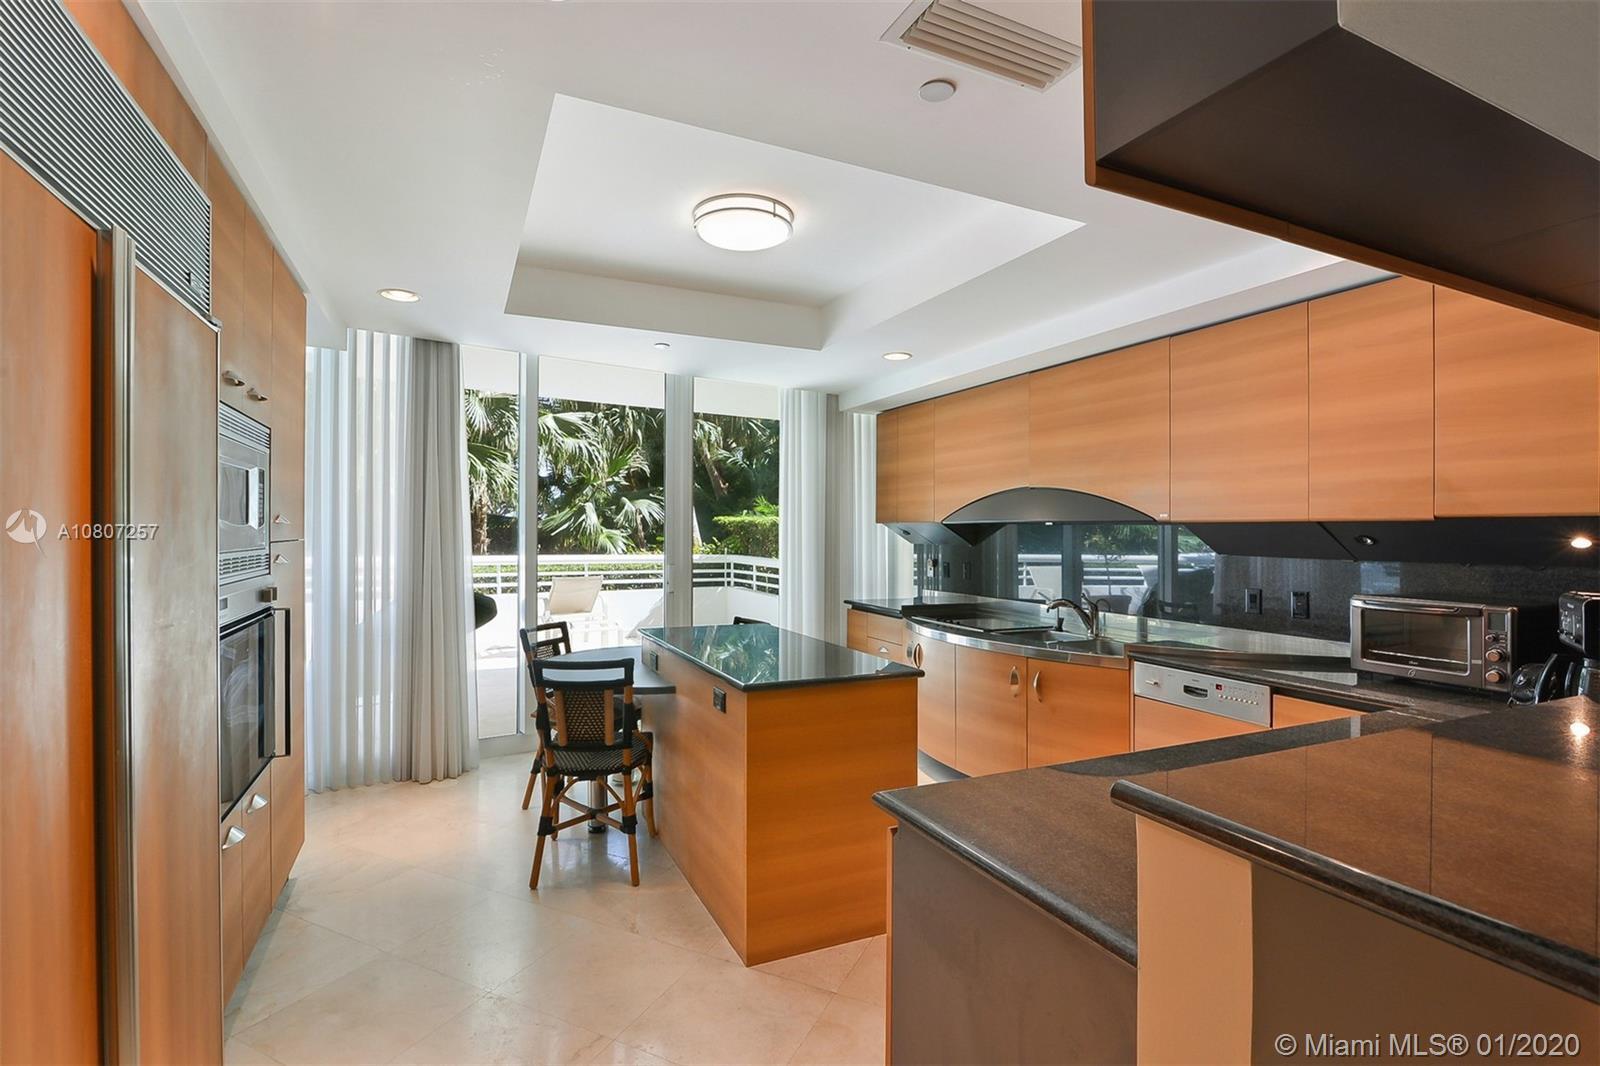 19955 NE 38th Ct #405, Aventura, FL 33180 - Aventura, FL real estate listing